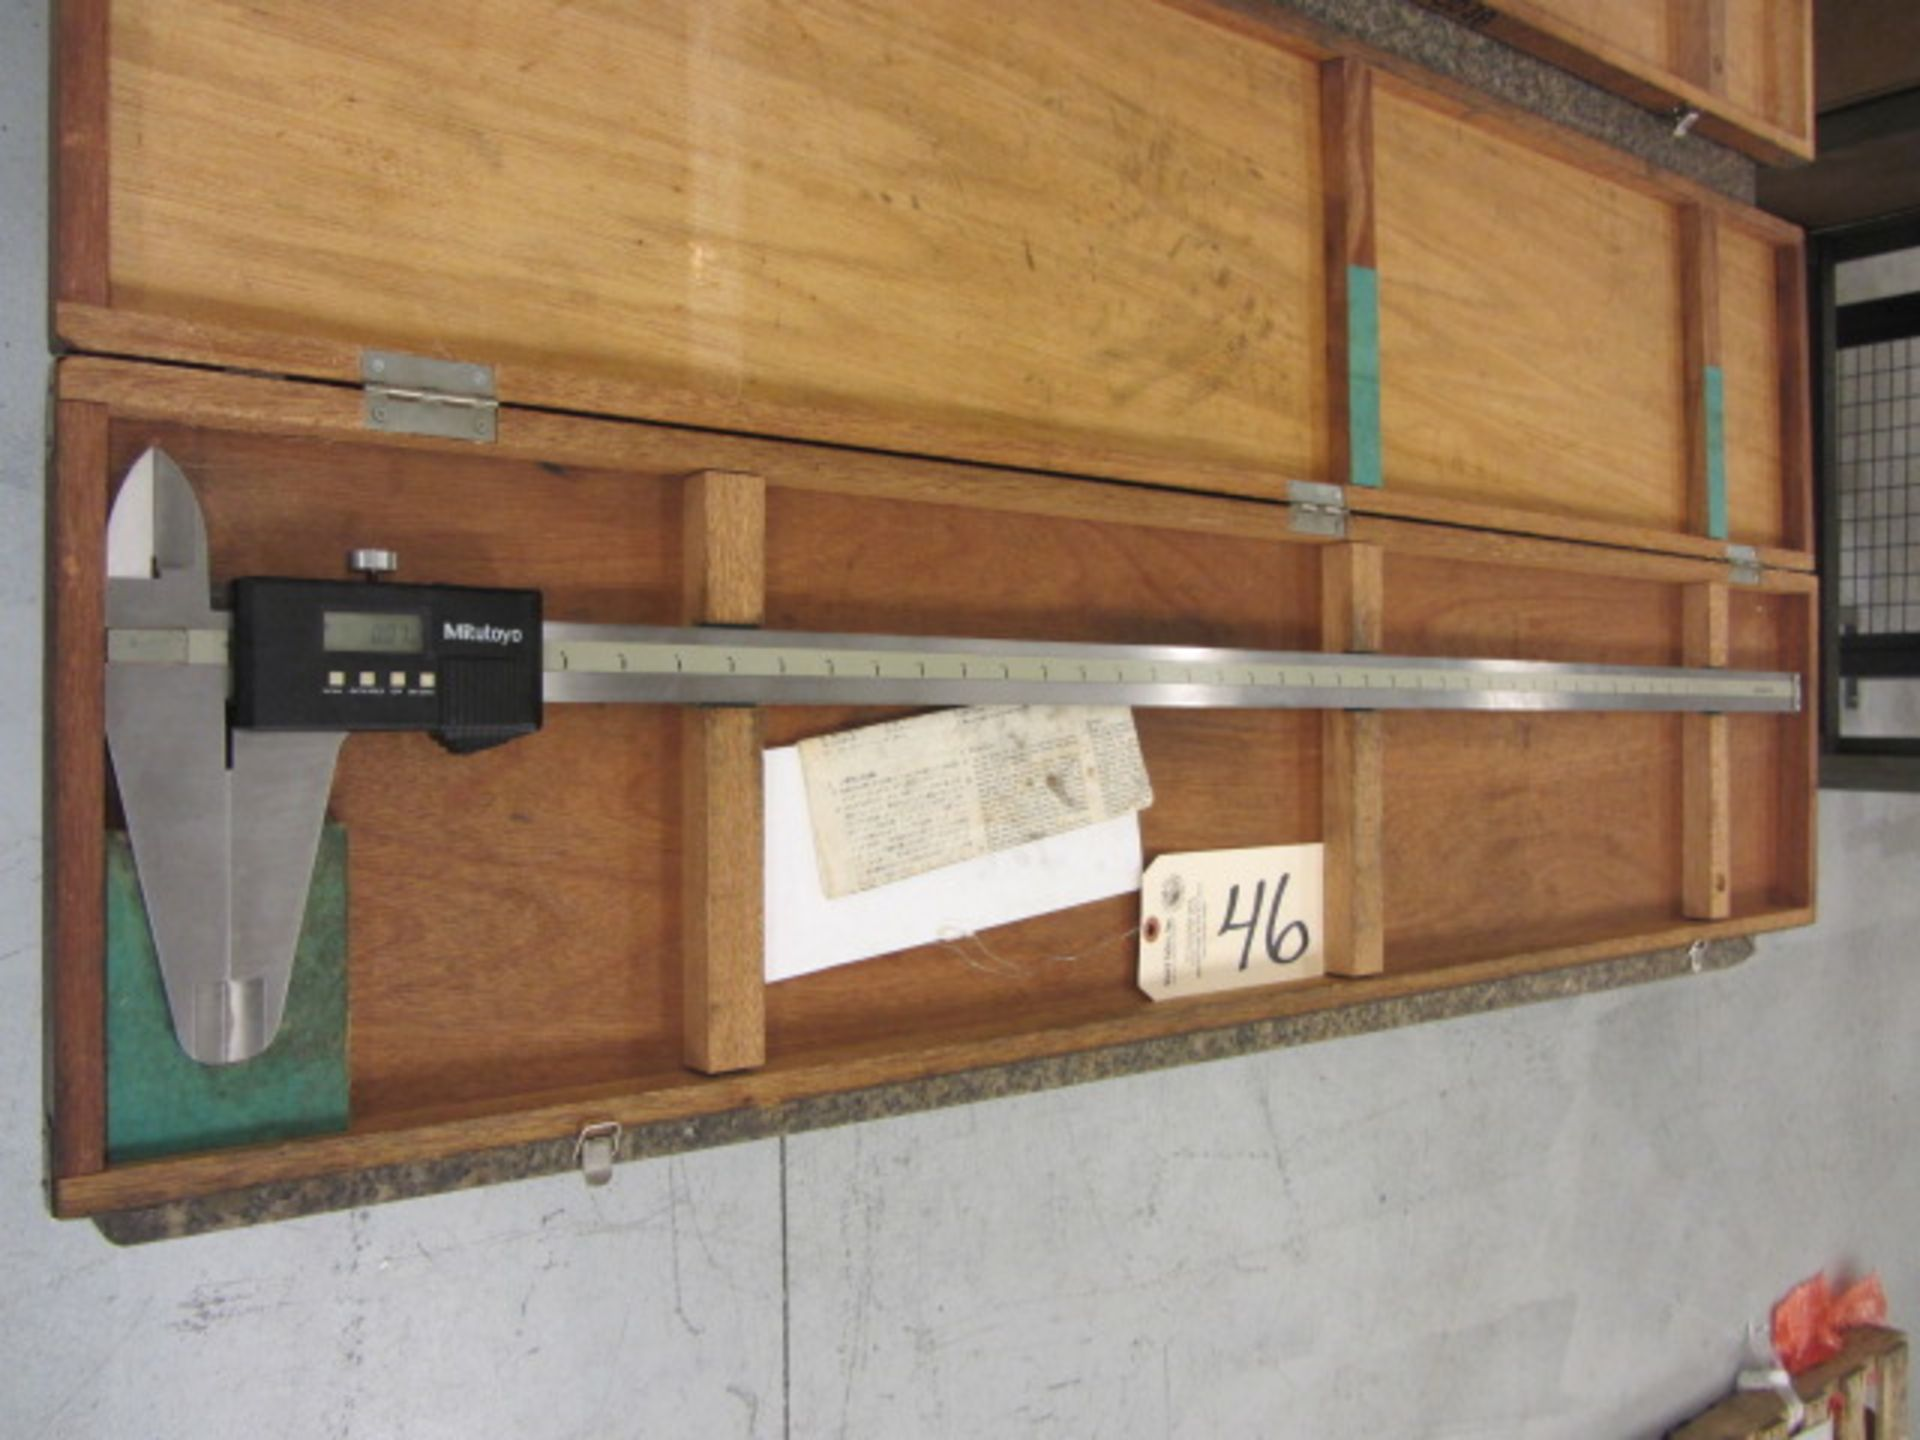 Lot 46 - Mitutoyo 40'' Digital Caliper